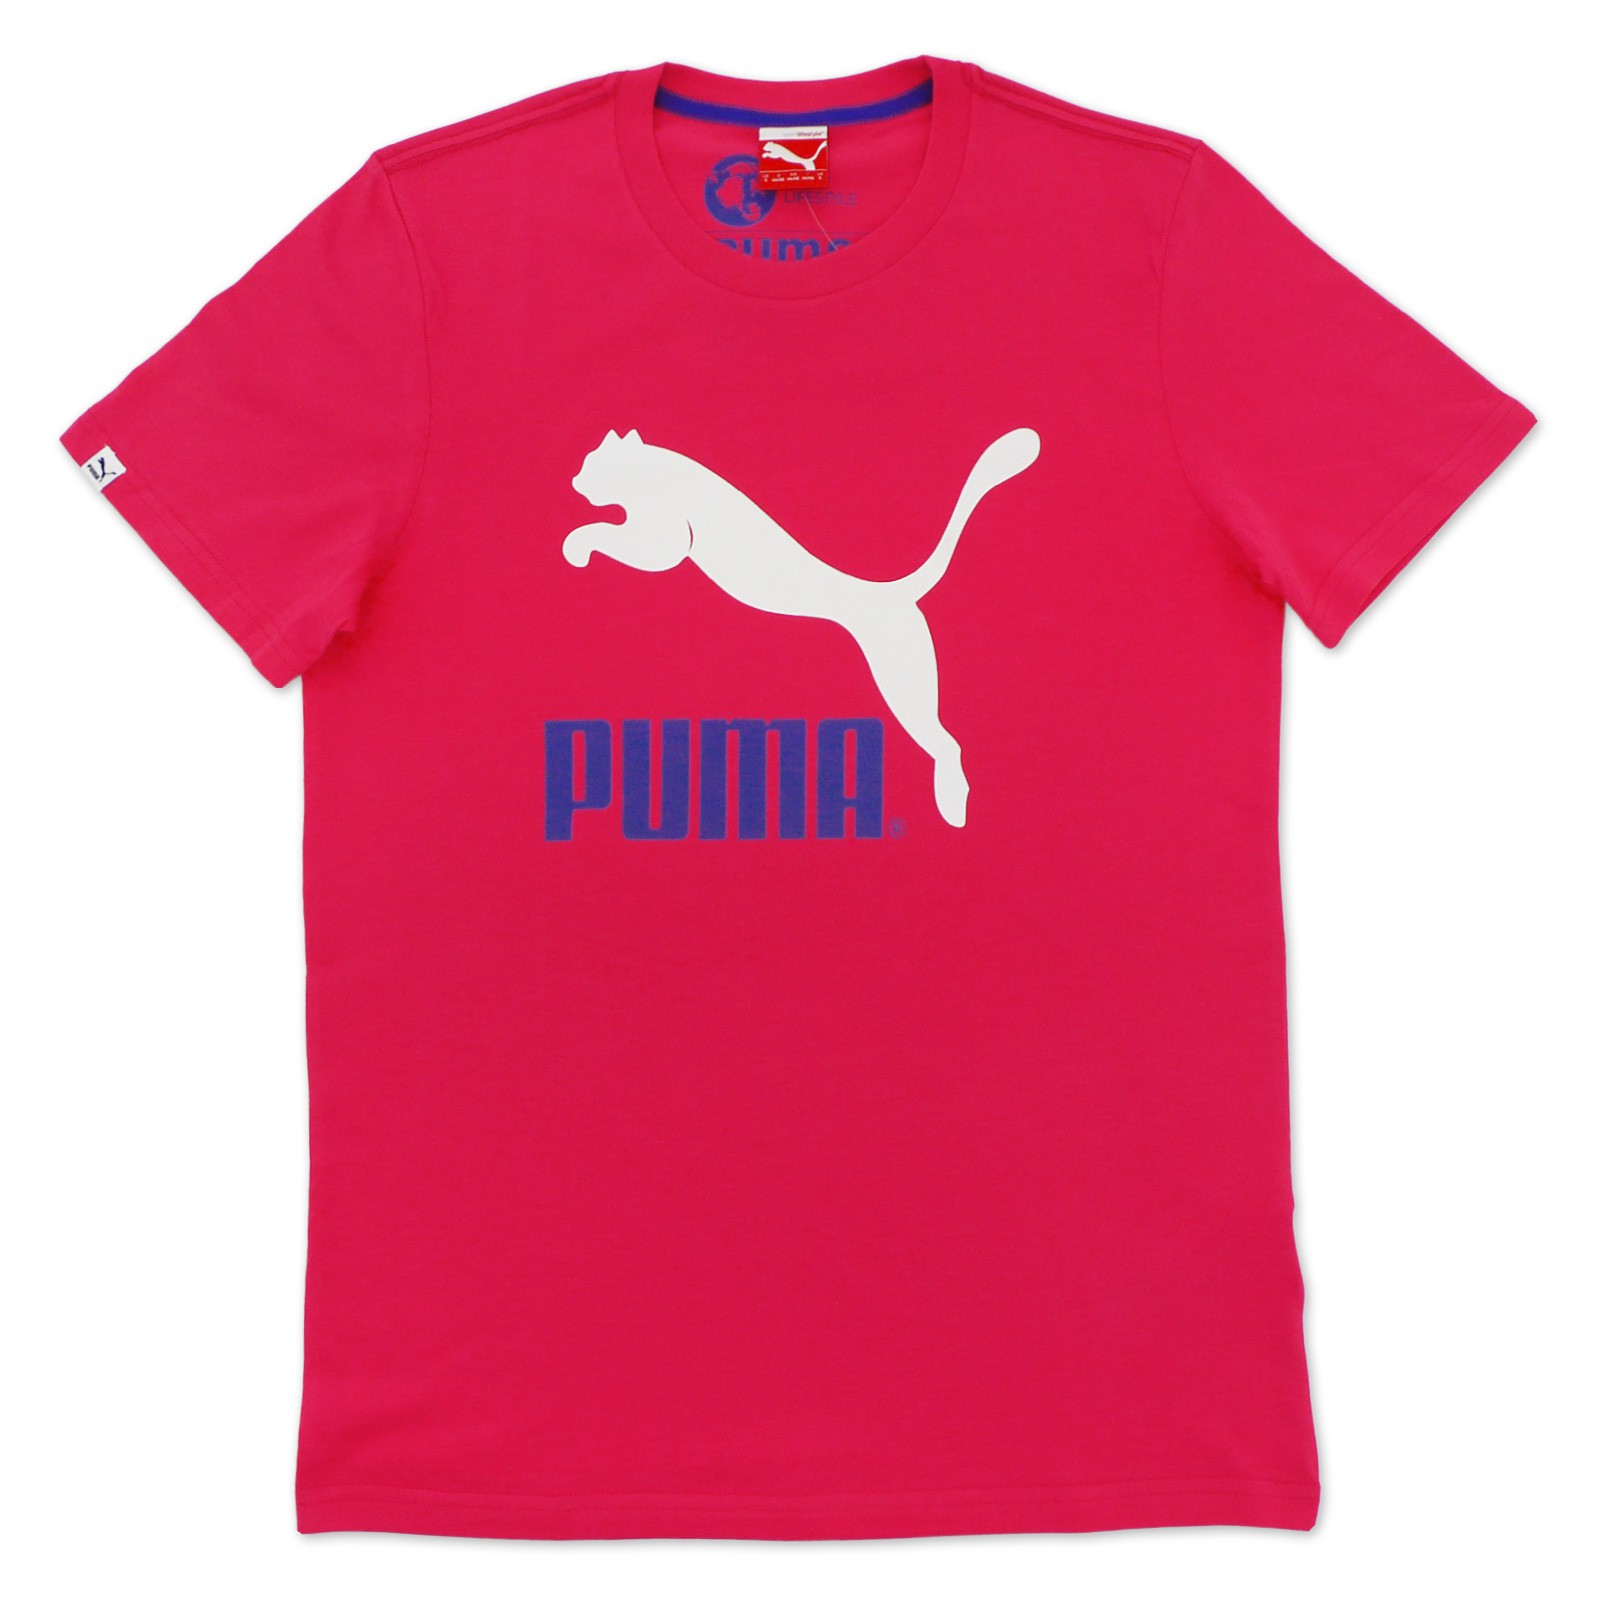 b68b1360dcd Details about Puma Originals Large Logo no.1 Tee Men's T-Shirt Pink Leisure  & Sports S-XXL